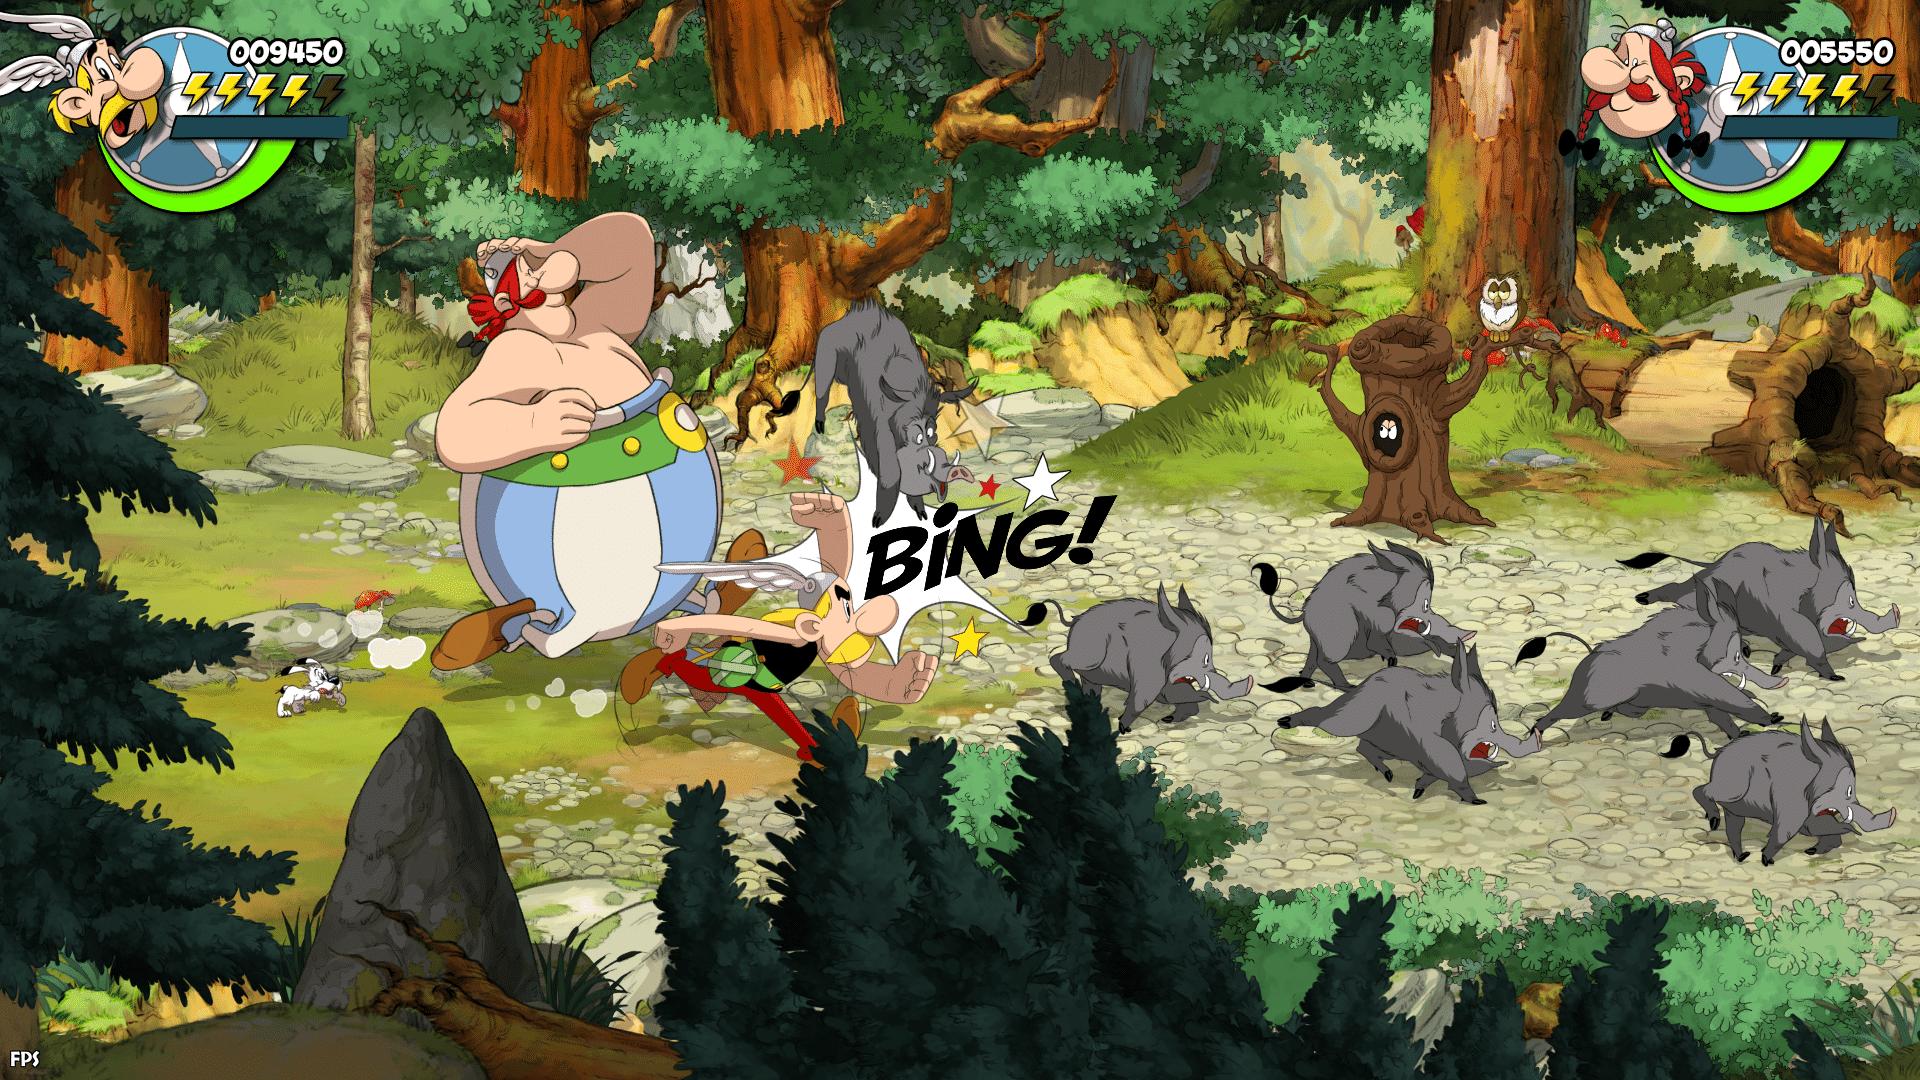 Asterix-und-obelix-slap-them-all-Screenshot-07